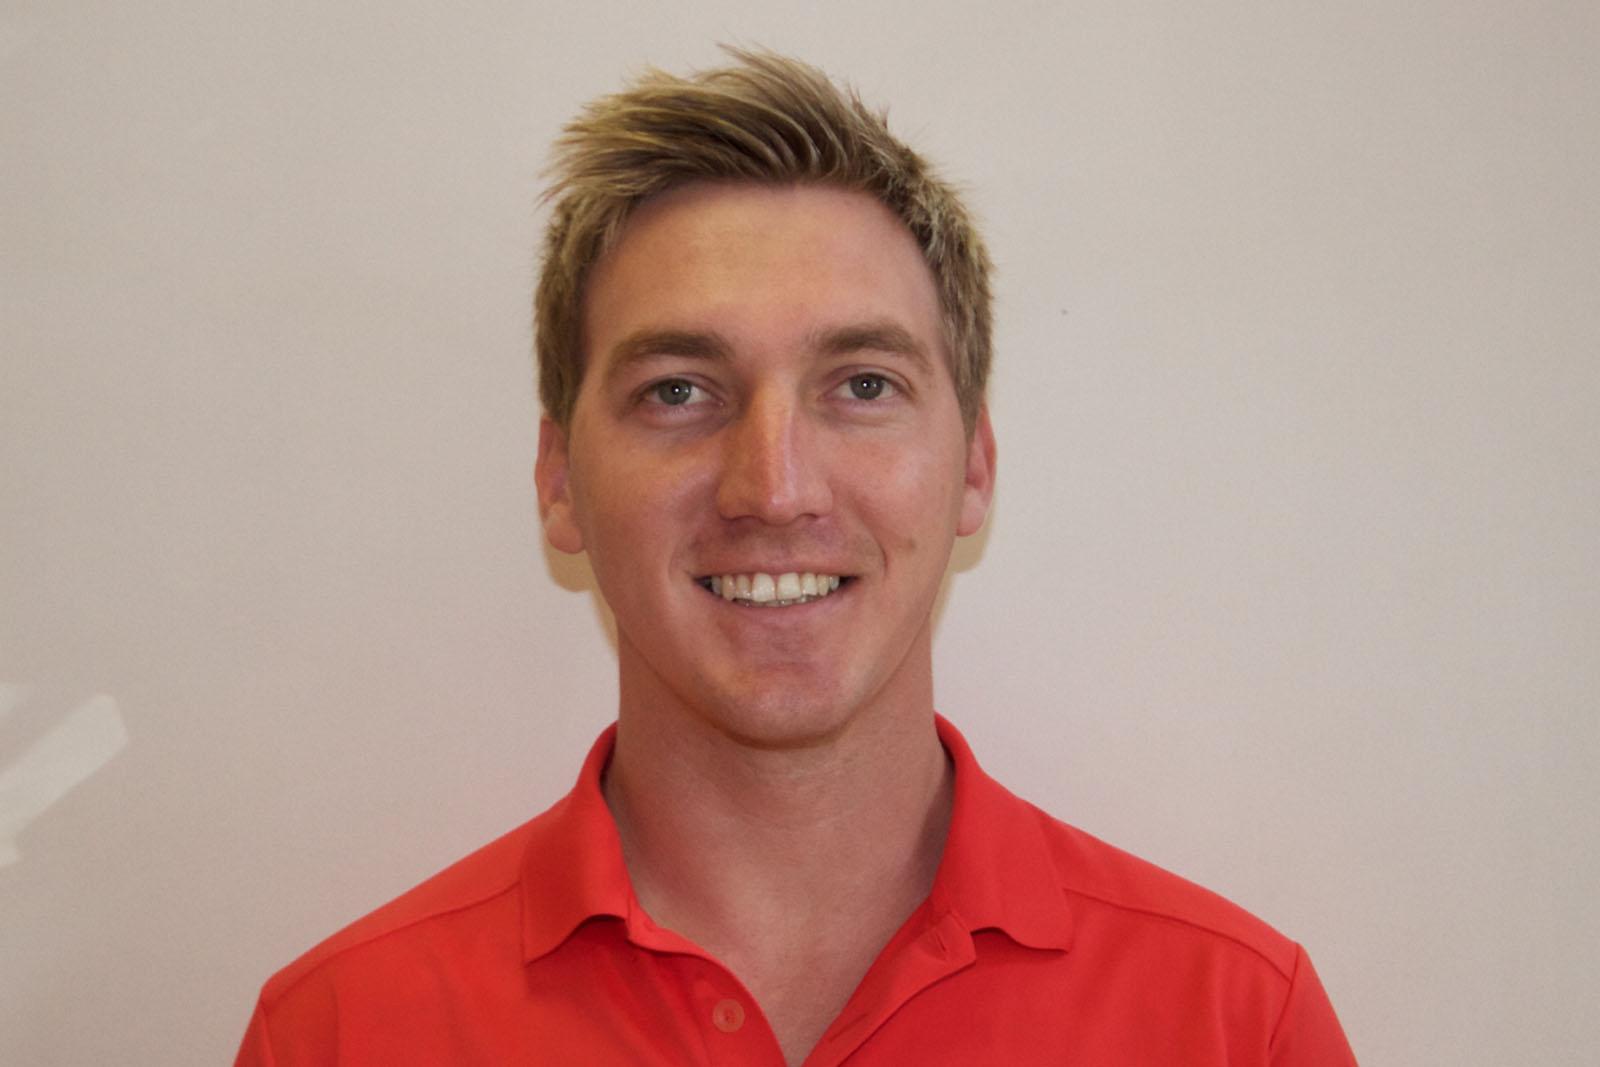 Christo du Plessis